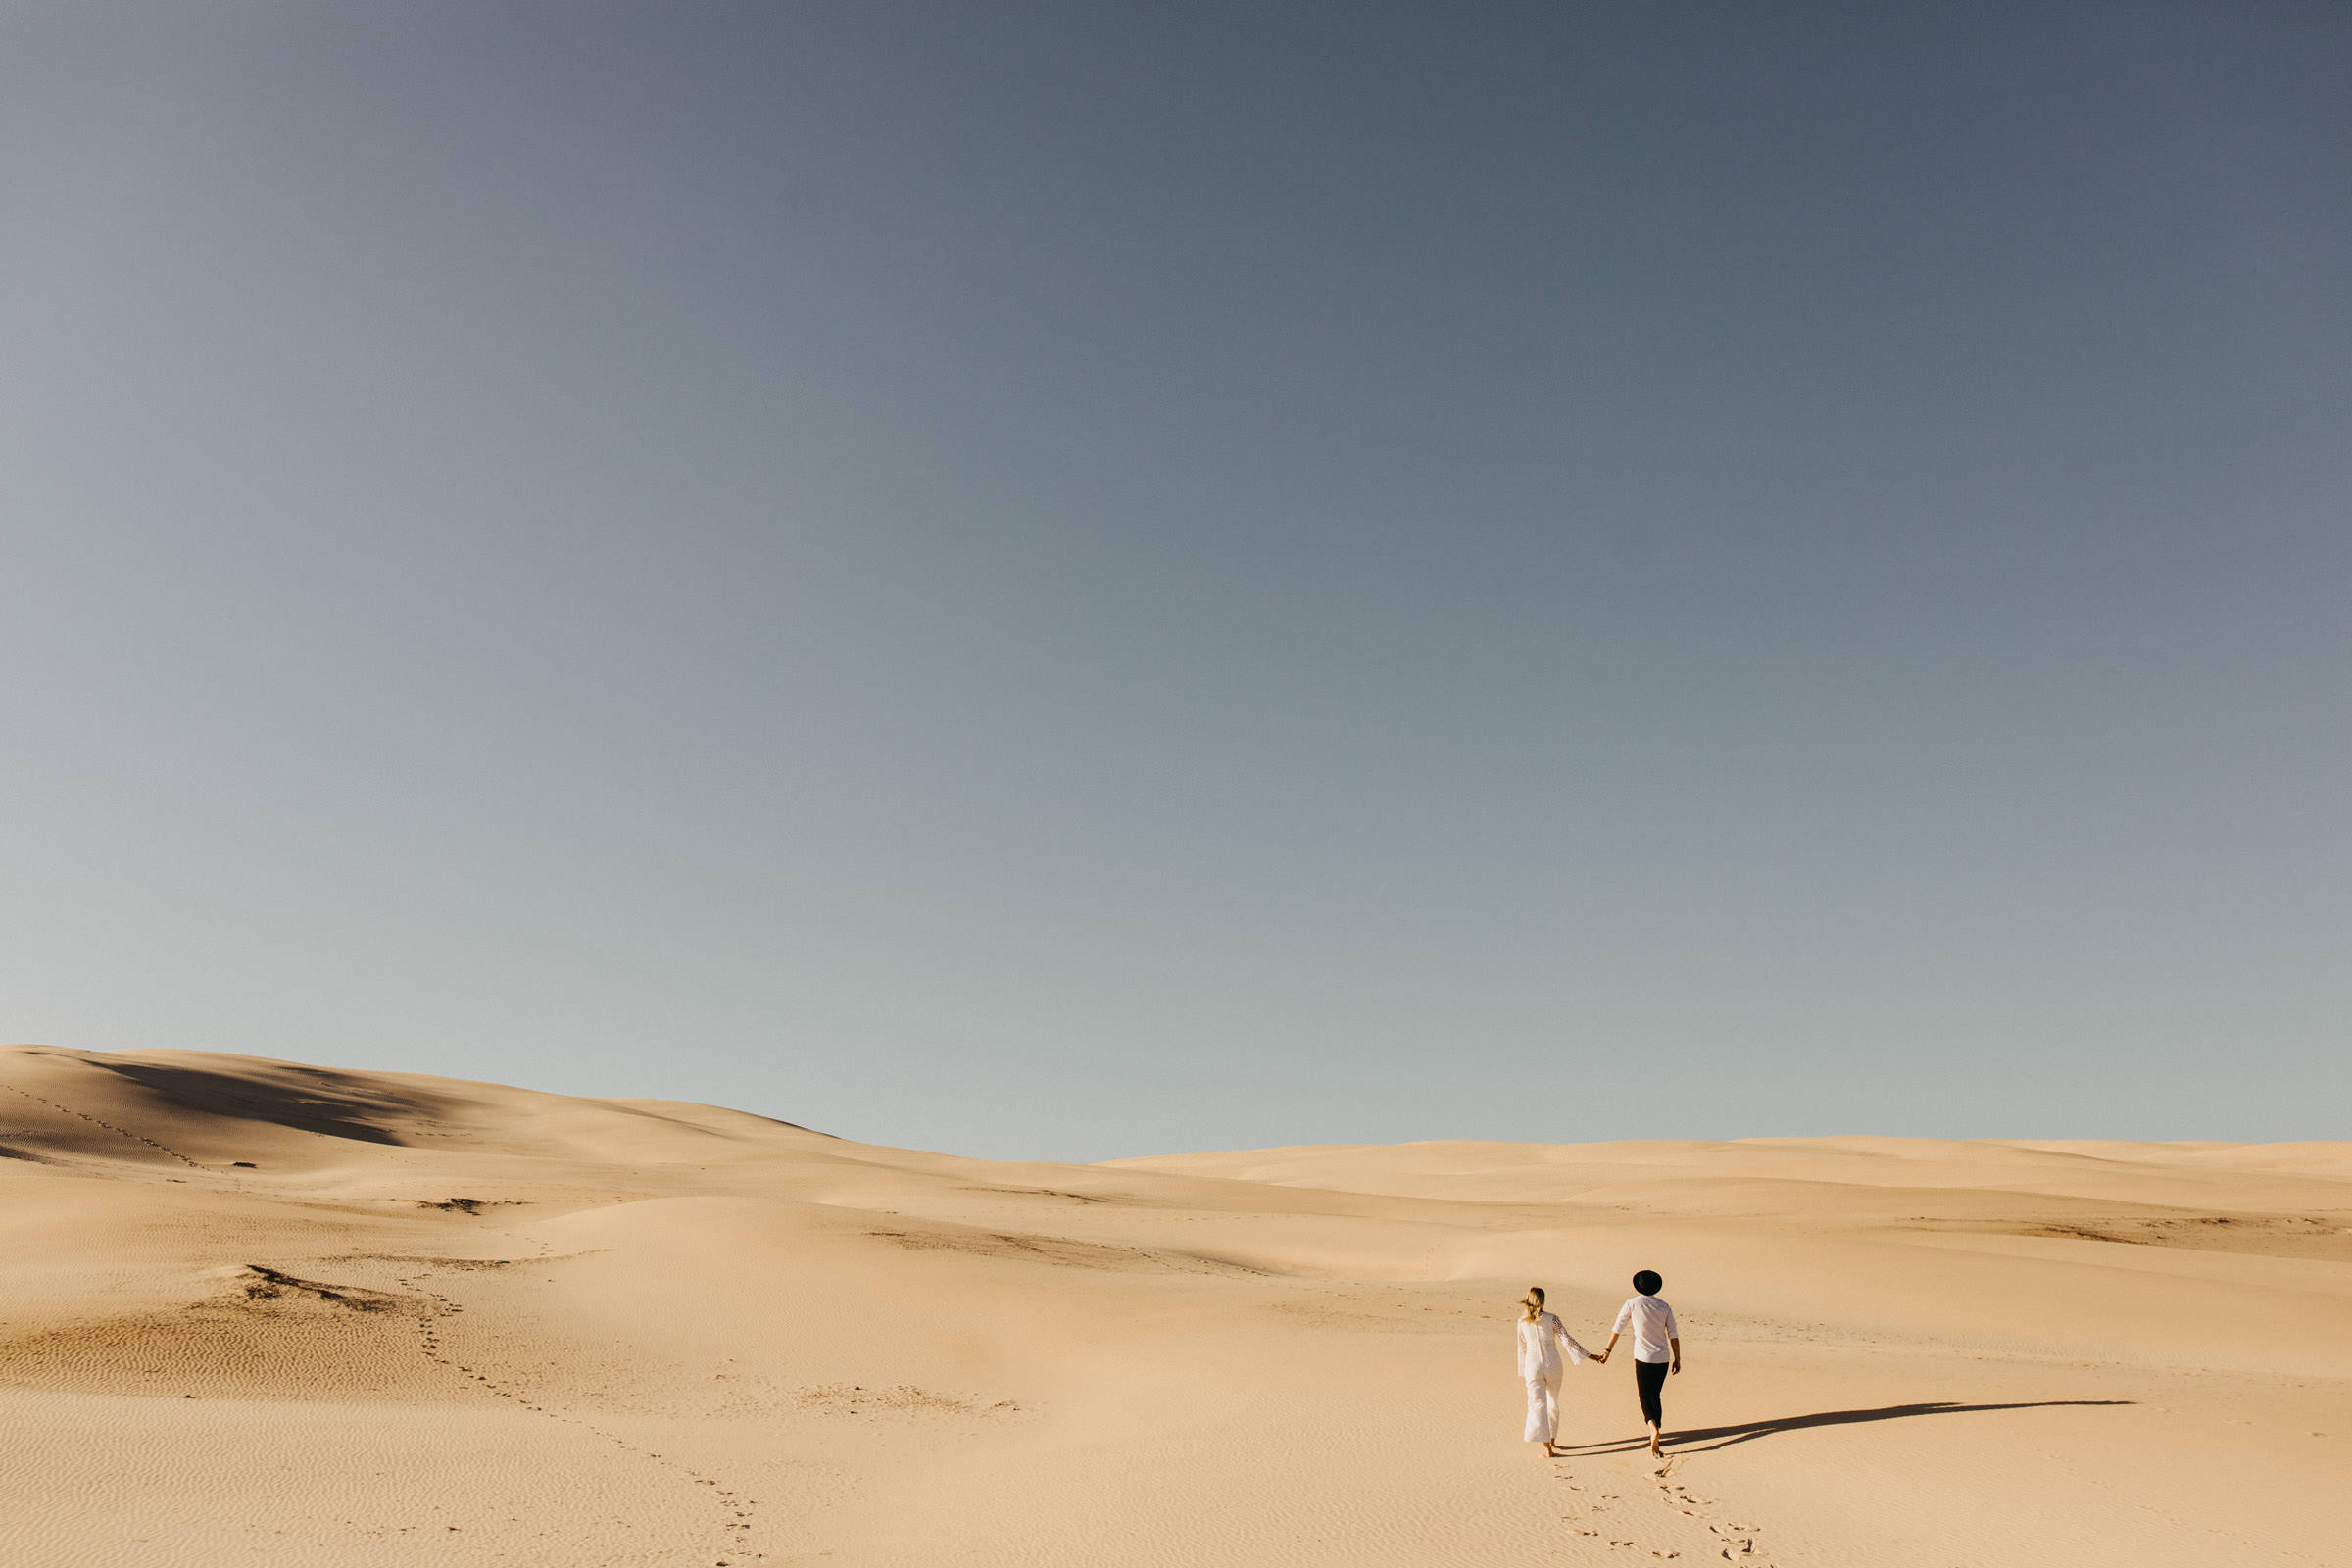 Stockon-sand-dunes-shoot-1-1.jpg